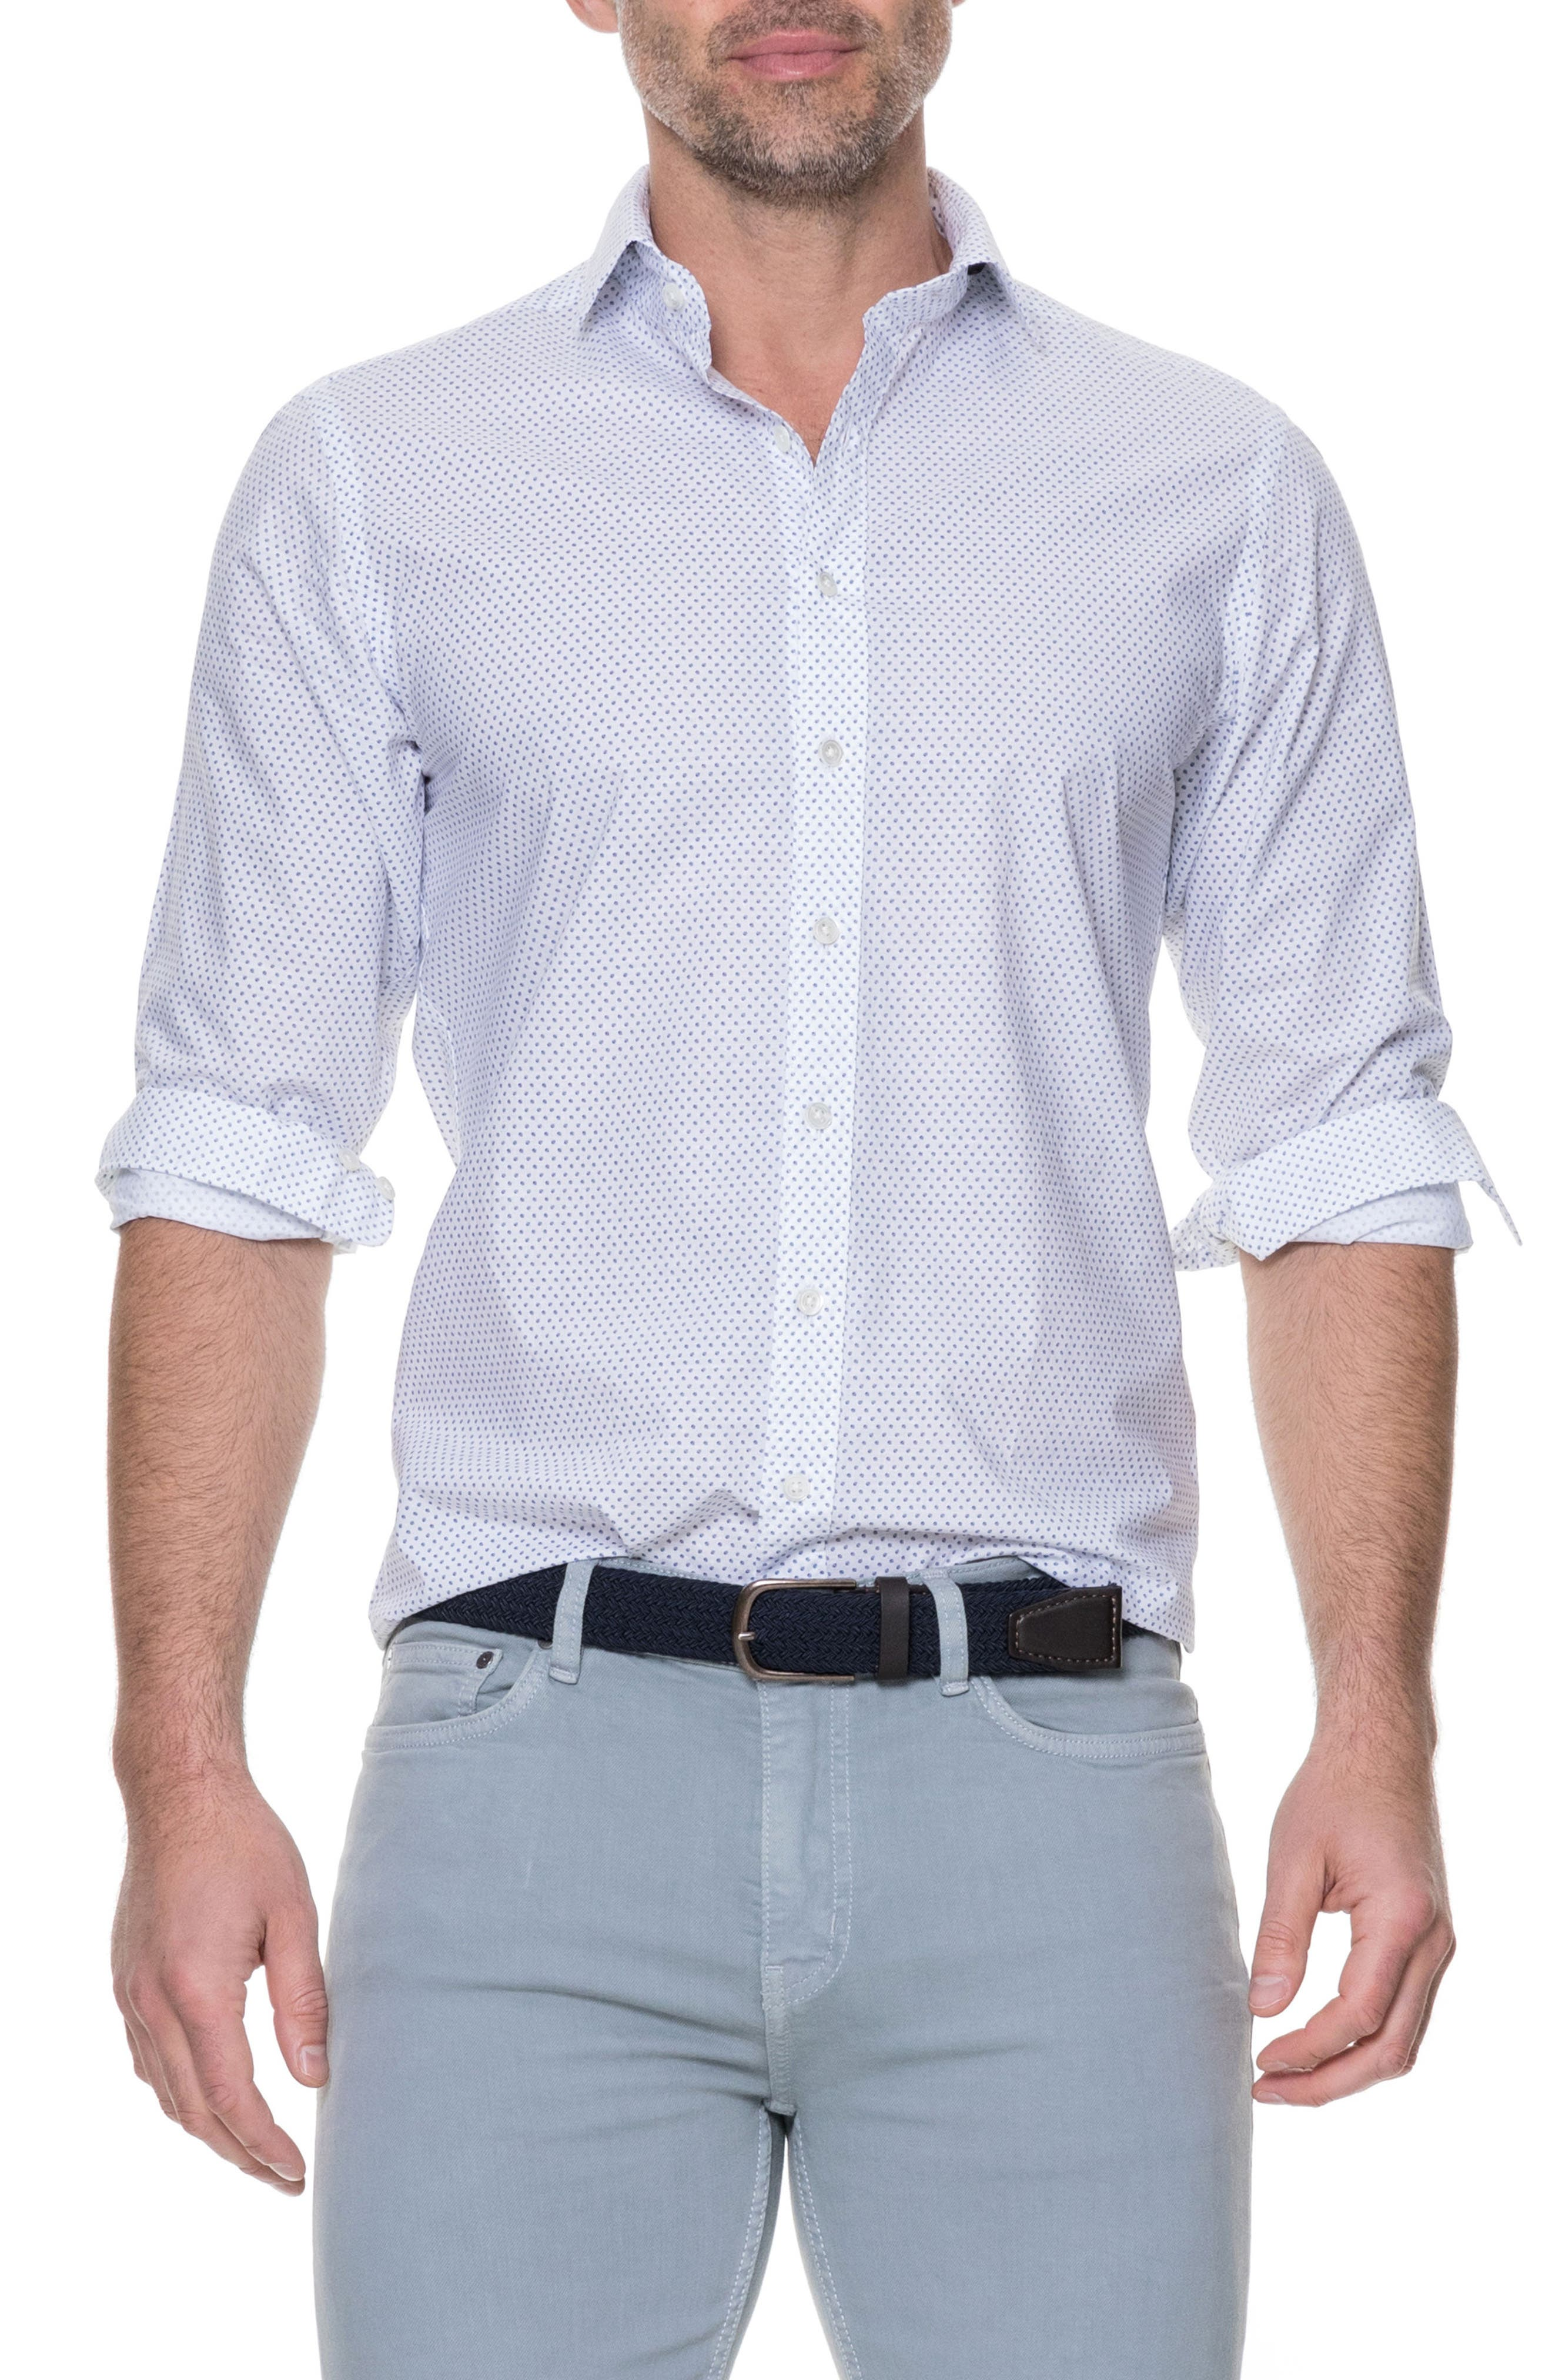 Butler Point Slim Fit Sport Shirt,                             Main thumbnail 1, color,                             Snow